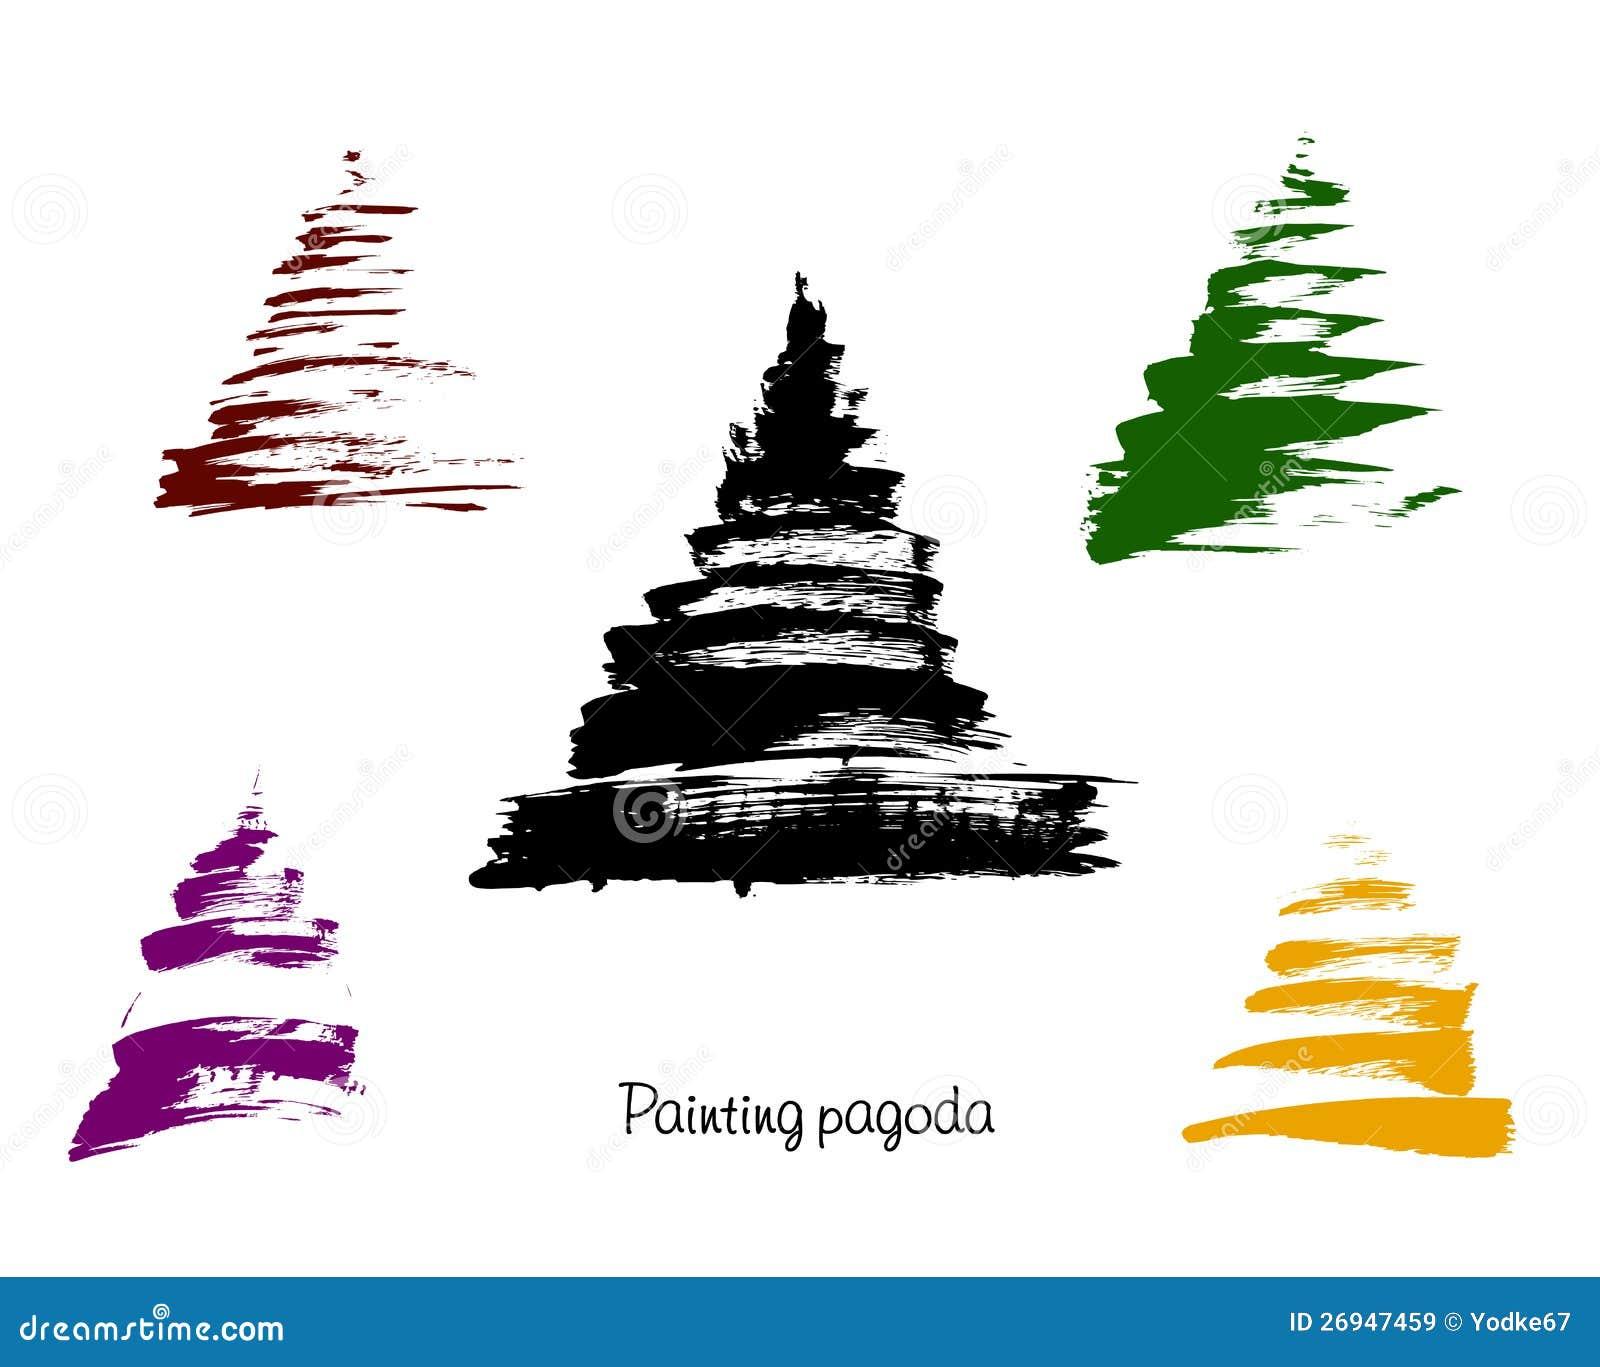 japanese pagoda plans, garden pagoda lanterns, garden statuary, pagoda design plans, pagoda house plans, square foot gardening plans, form cement chinese pagoda plans, wood pagoda plans, outdoor fireplace plans, pagoda construction plans, pagoda structure plans, on pagoda garden design plans